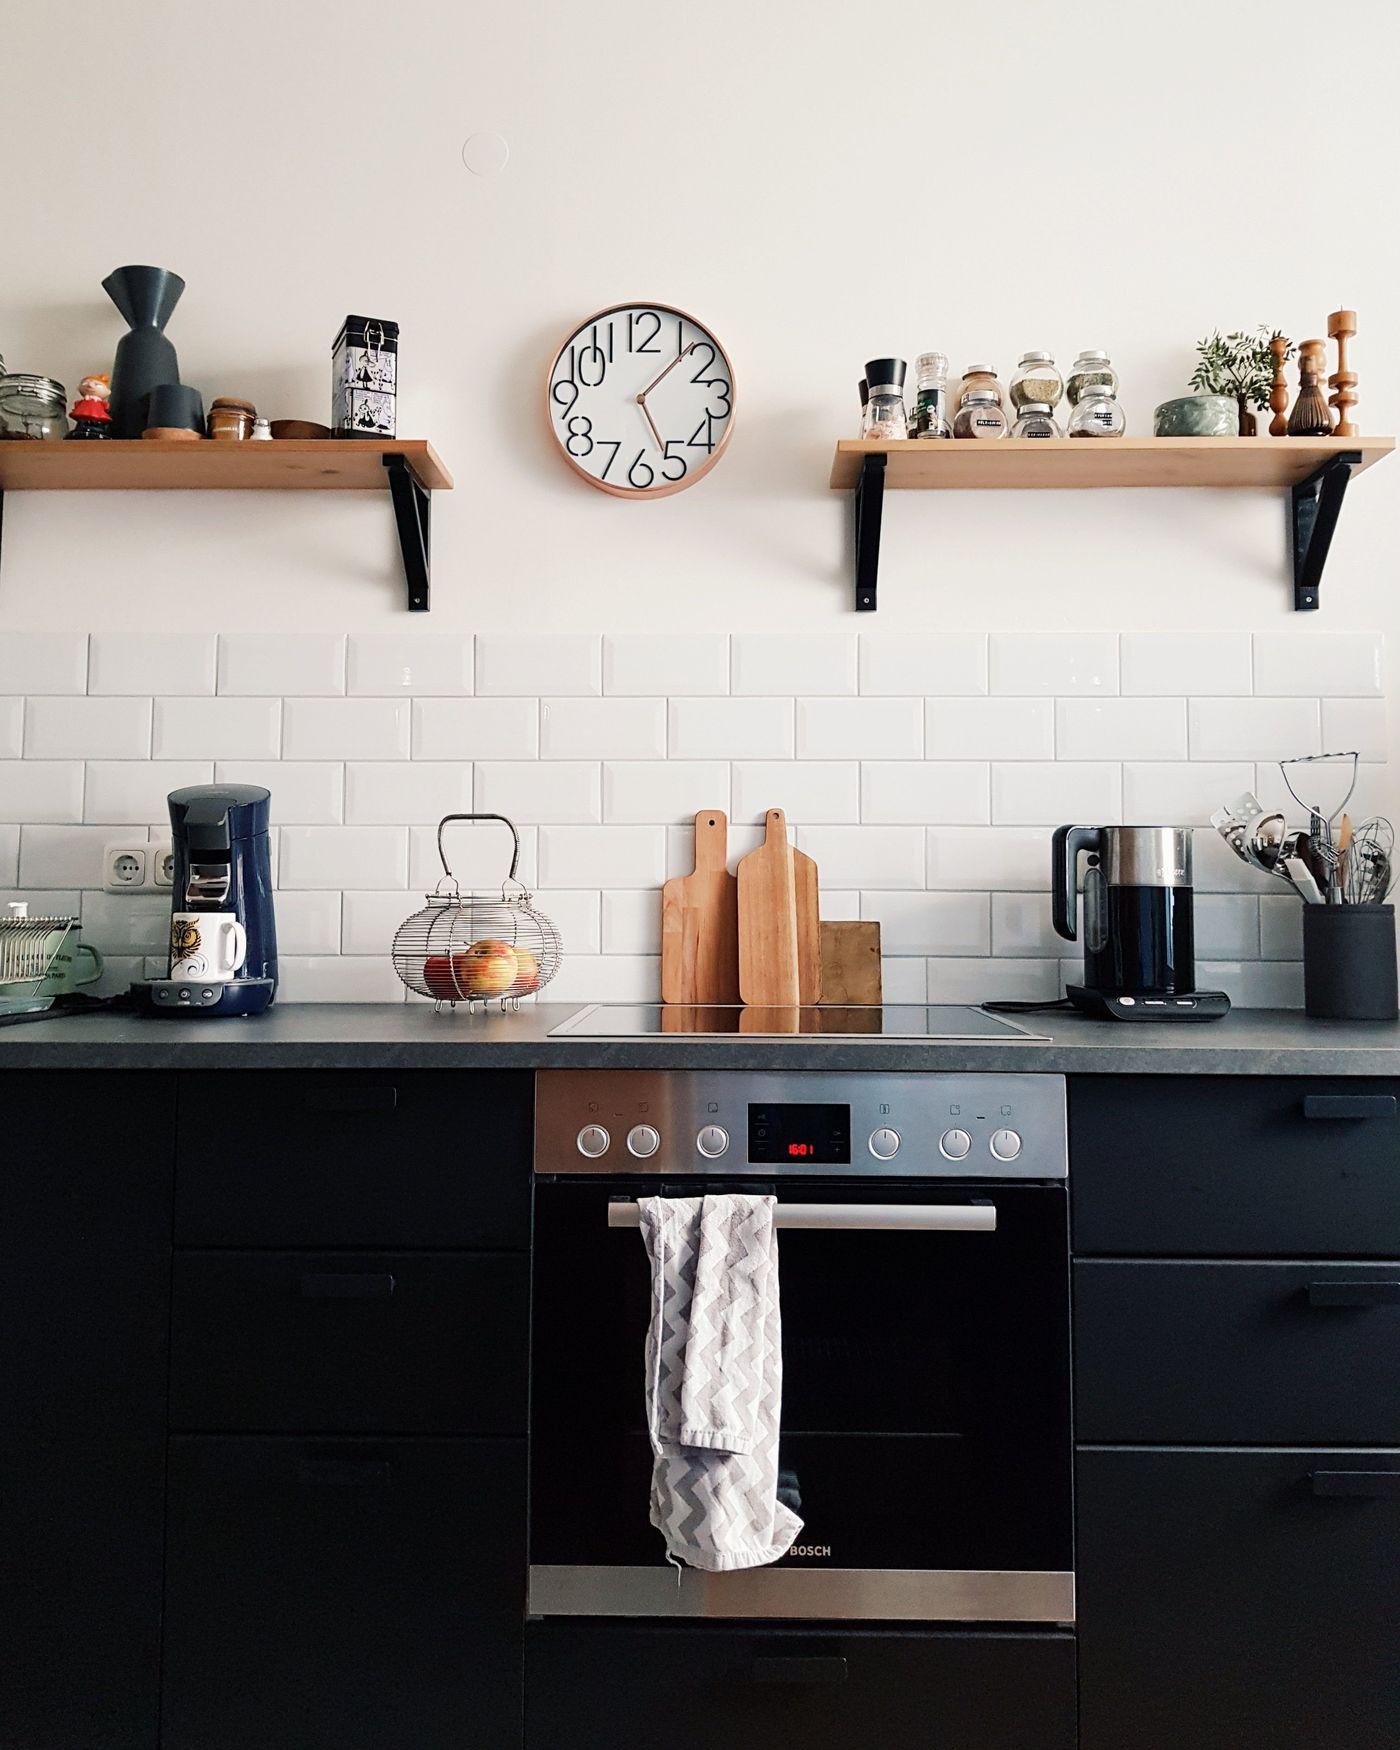 Full Size of Küchenrückwand Ideen Kchenrckwand Materialien Bad Renovieren Wohnzimmer Tapeten Wohnzimmer Küchenrückwand Ideen